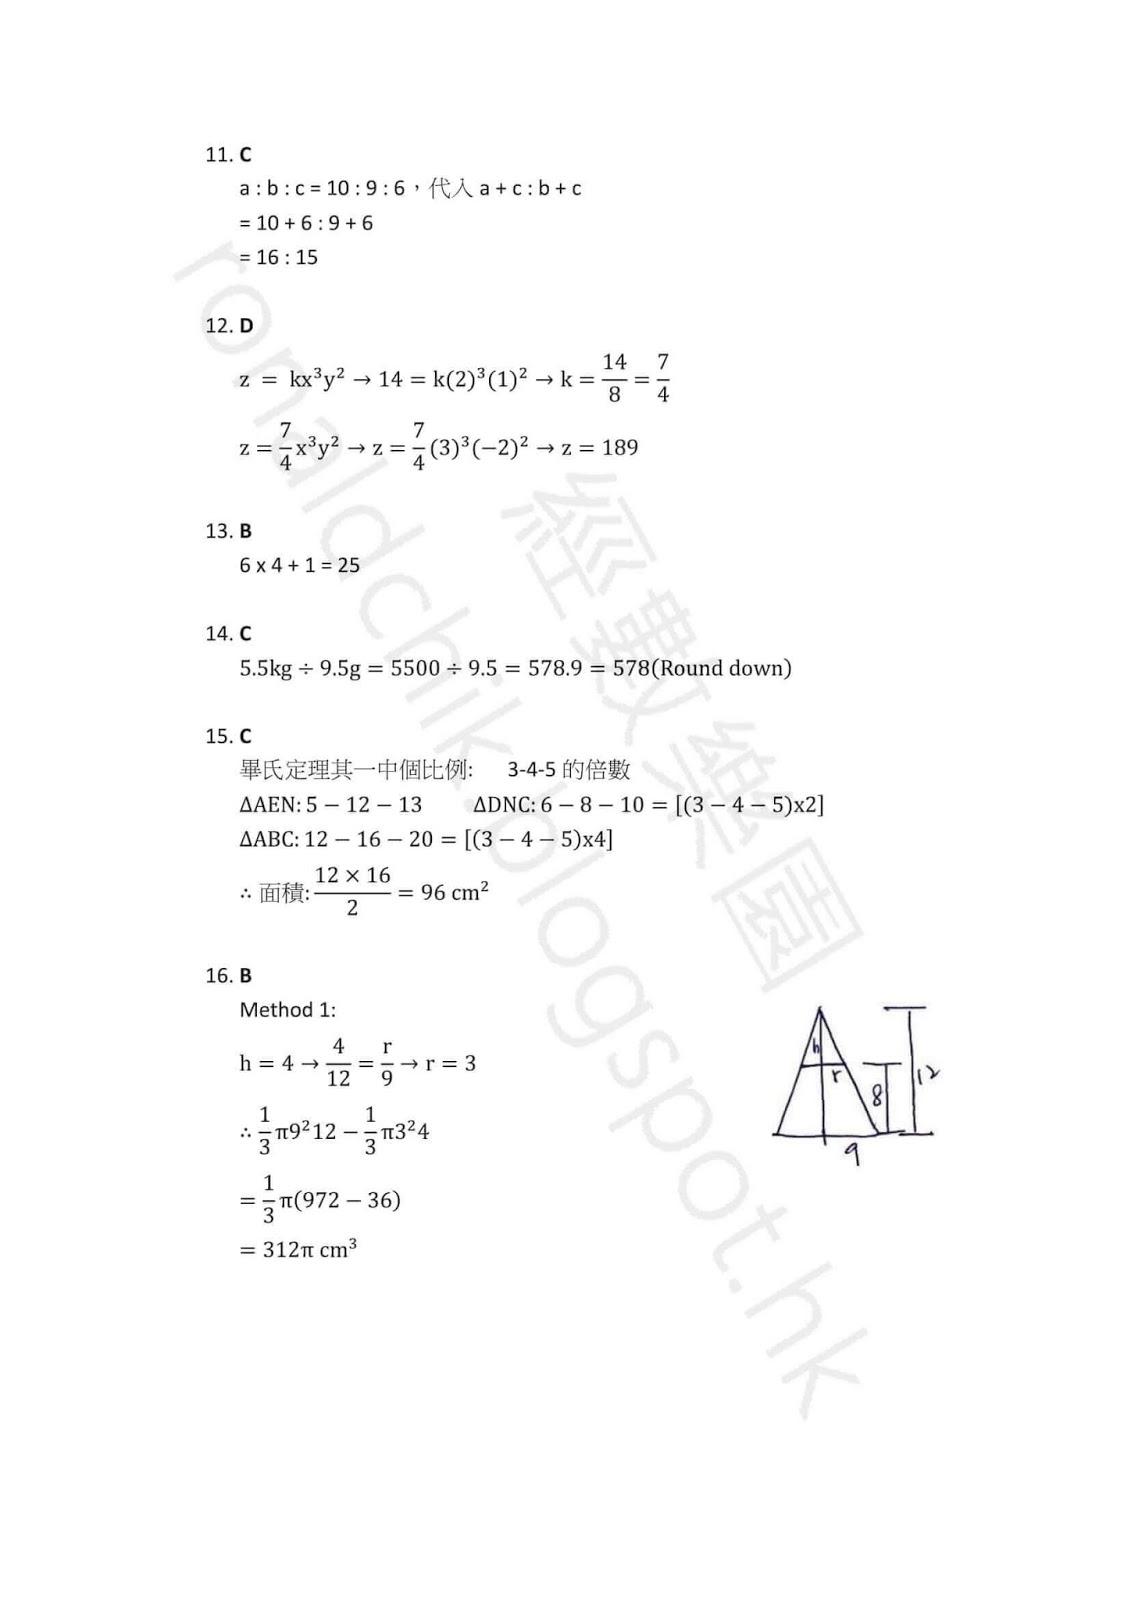 2015 DSE Math 數學 Paper 2 MC 卷二 答案 Q11,12,13,14,15,16